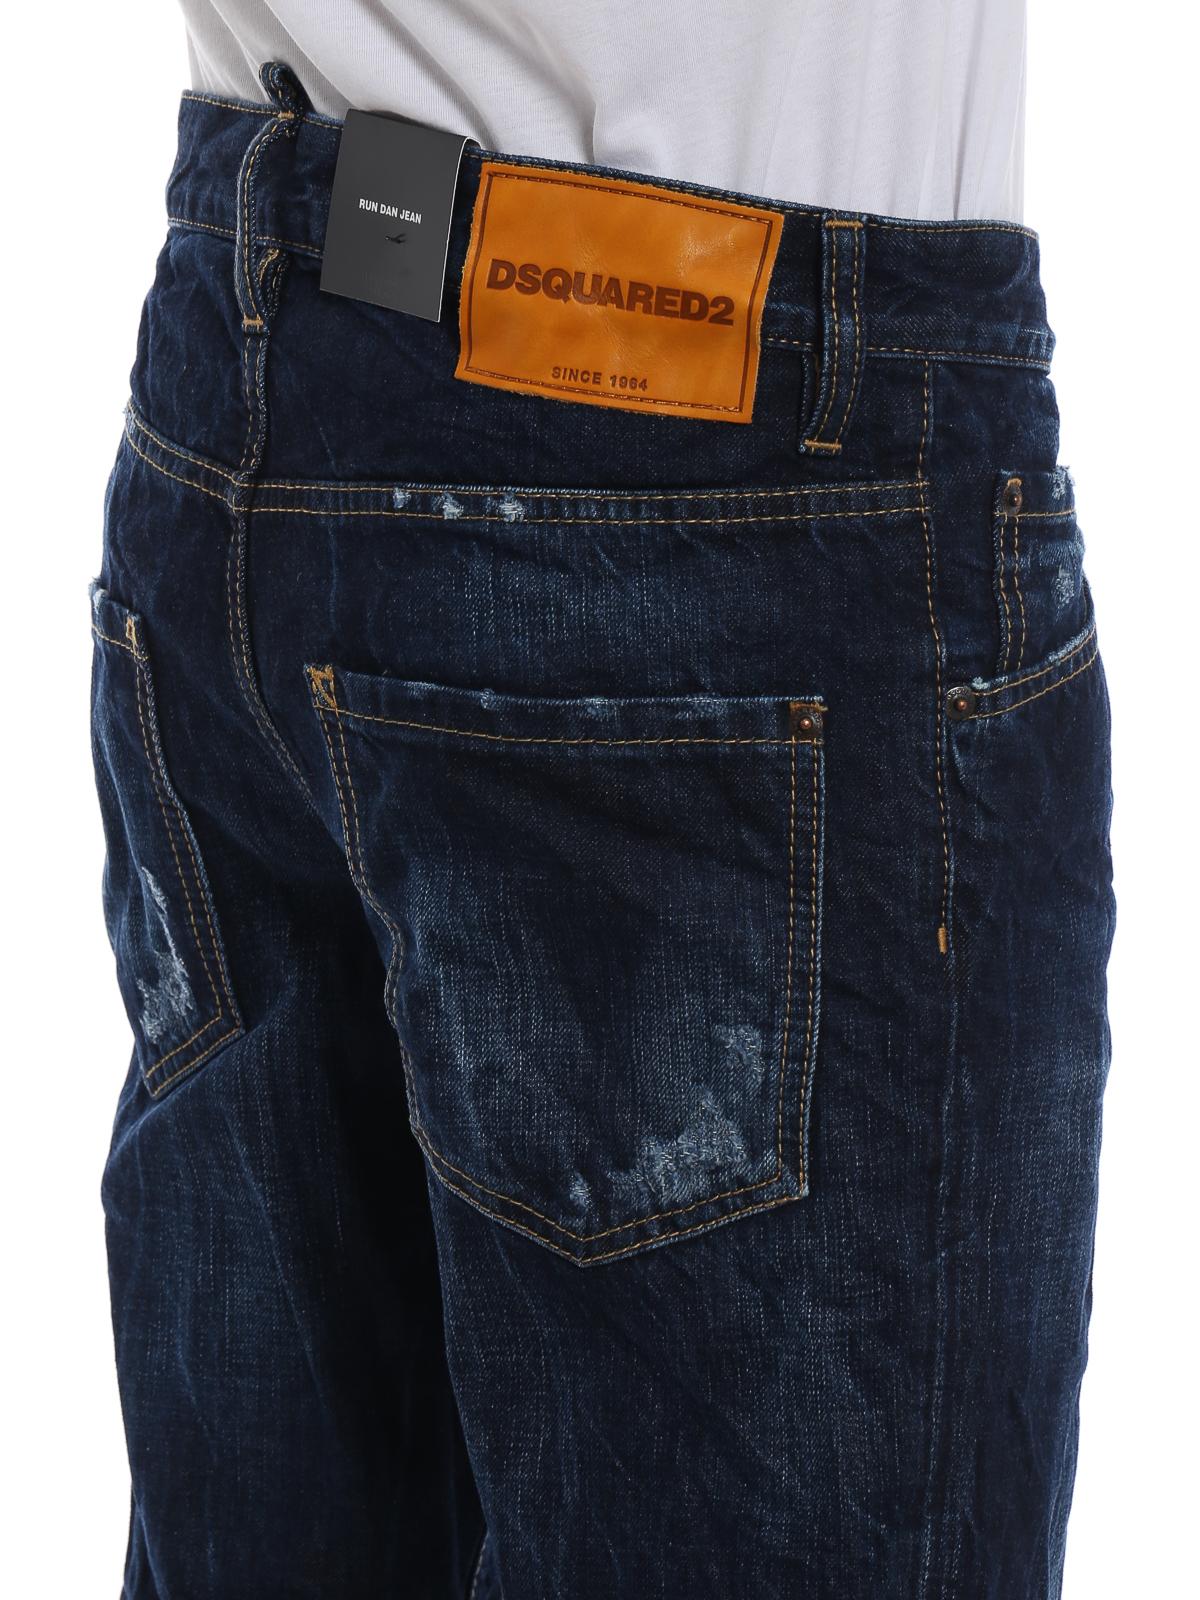 6ea148e94391a9 DSQUARED2 buy online Run Dan dark wash used effect denim jeans. DSQUARED2: straight  leg ...